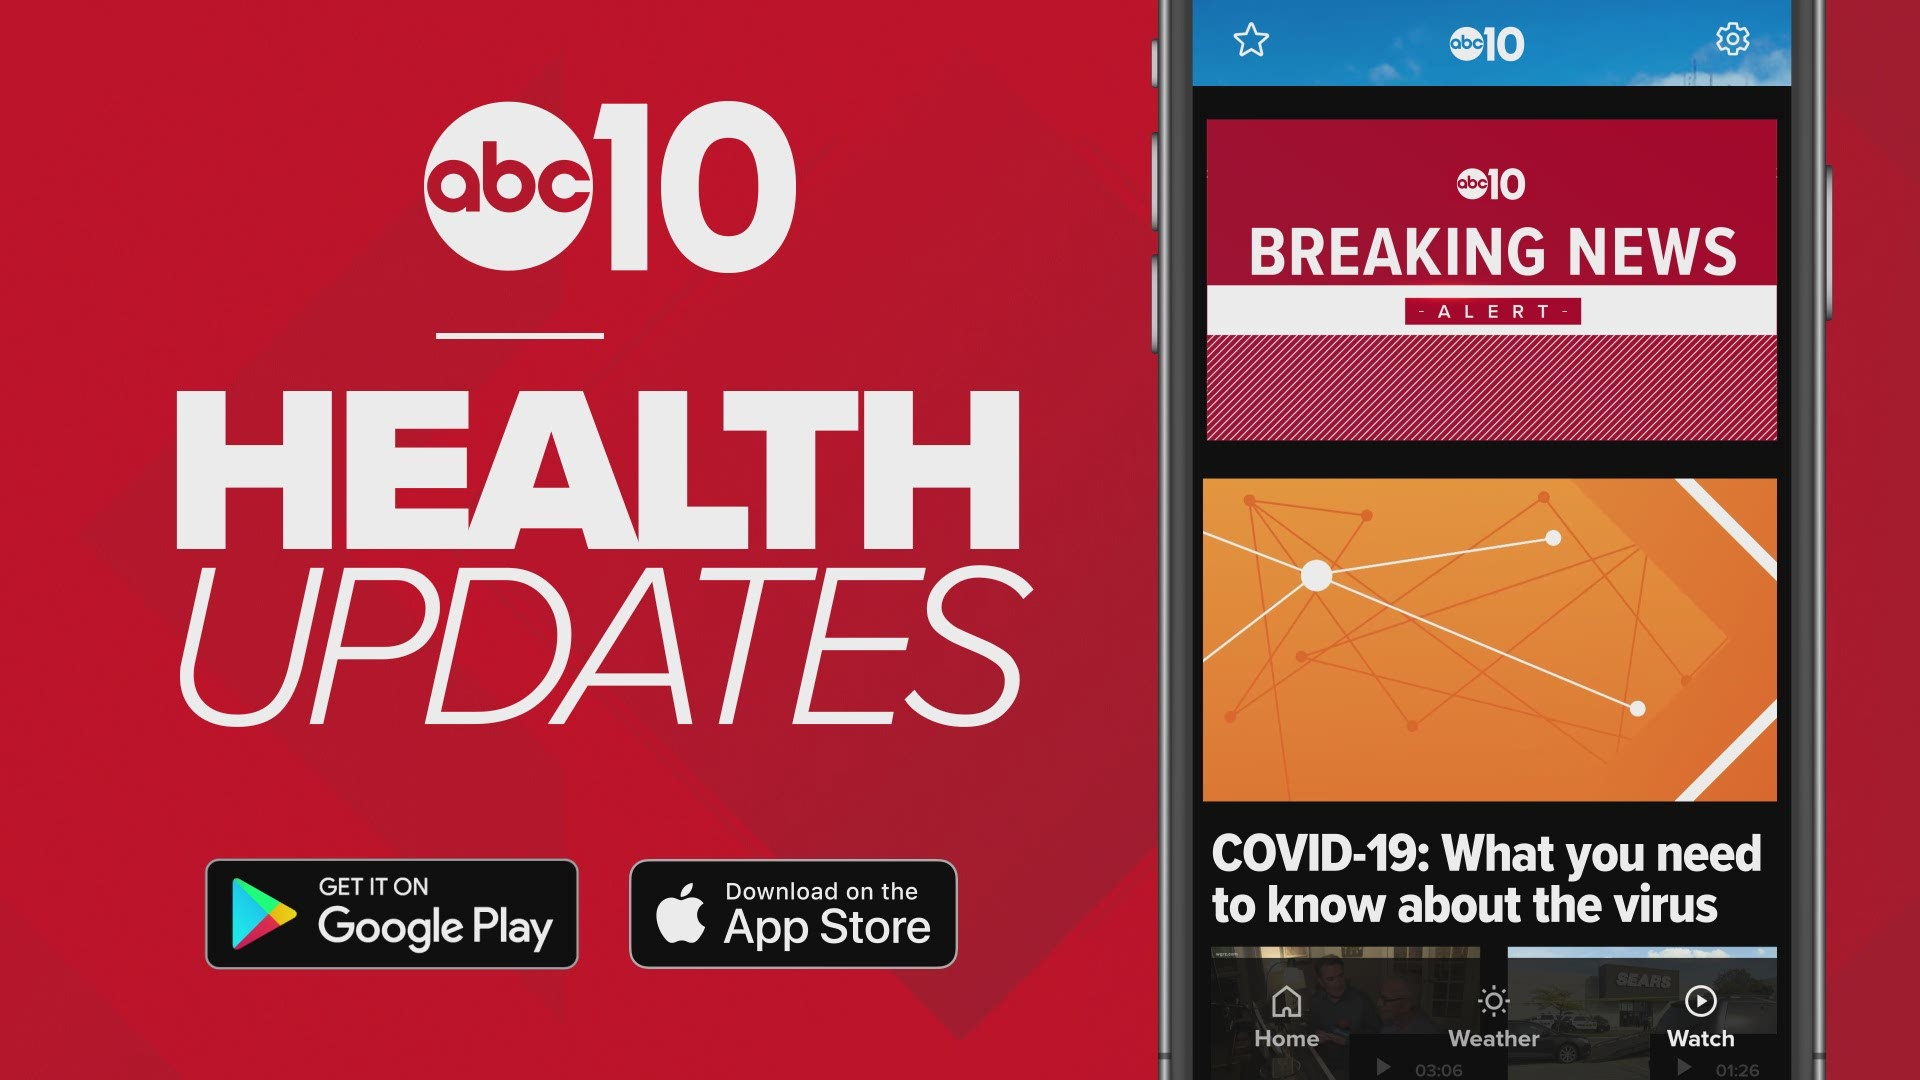 Jury Duty in Sacramento during coronavirus: Here's what to know | abc10.com